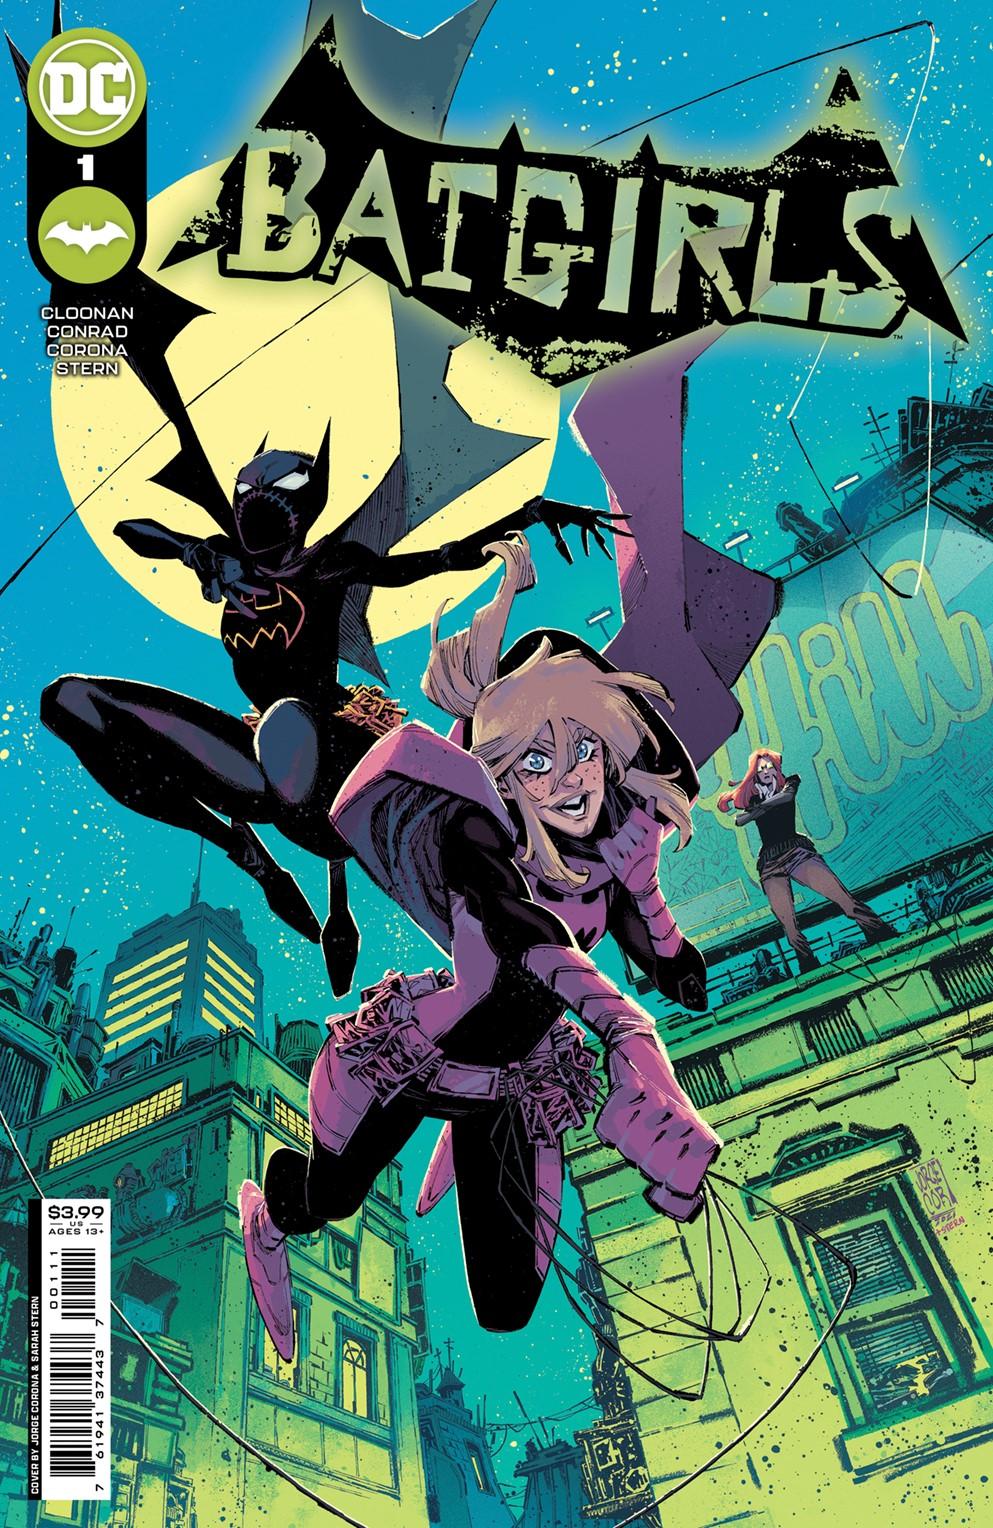 Batgirls_Cv1_main_JorgeCorona DC Comics December 2021 Solicitations